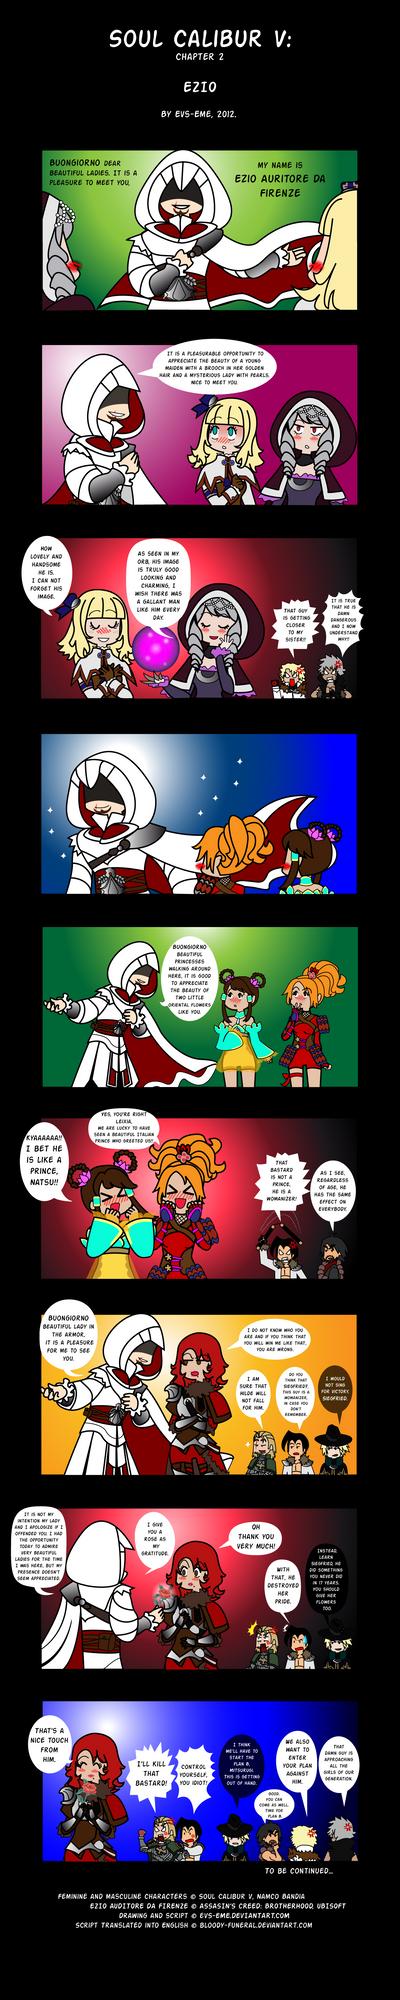 Soul Calibur V- chapter II: Ezio by evs-eme